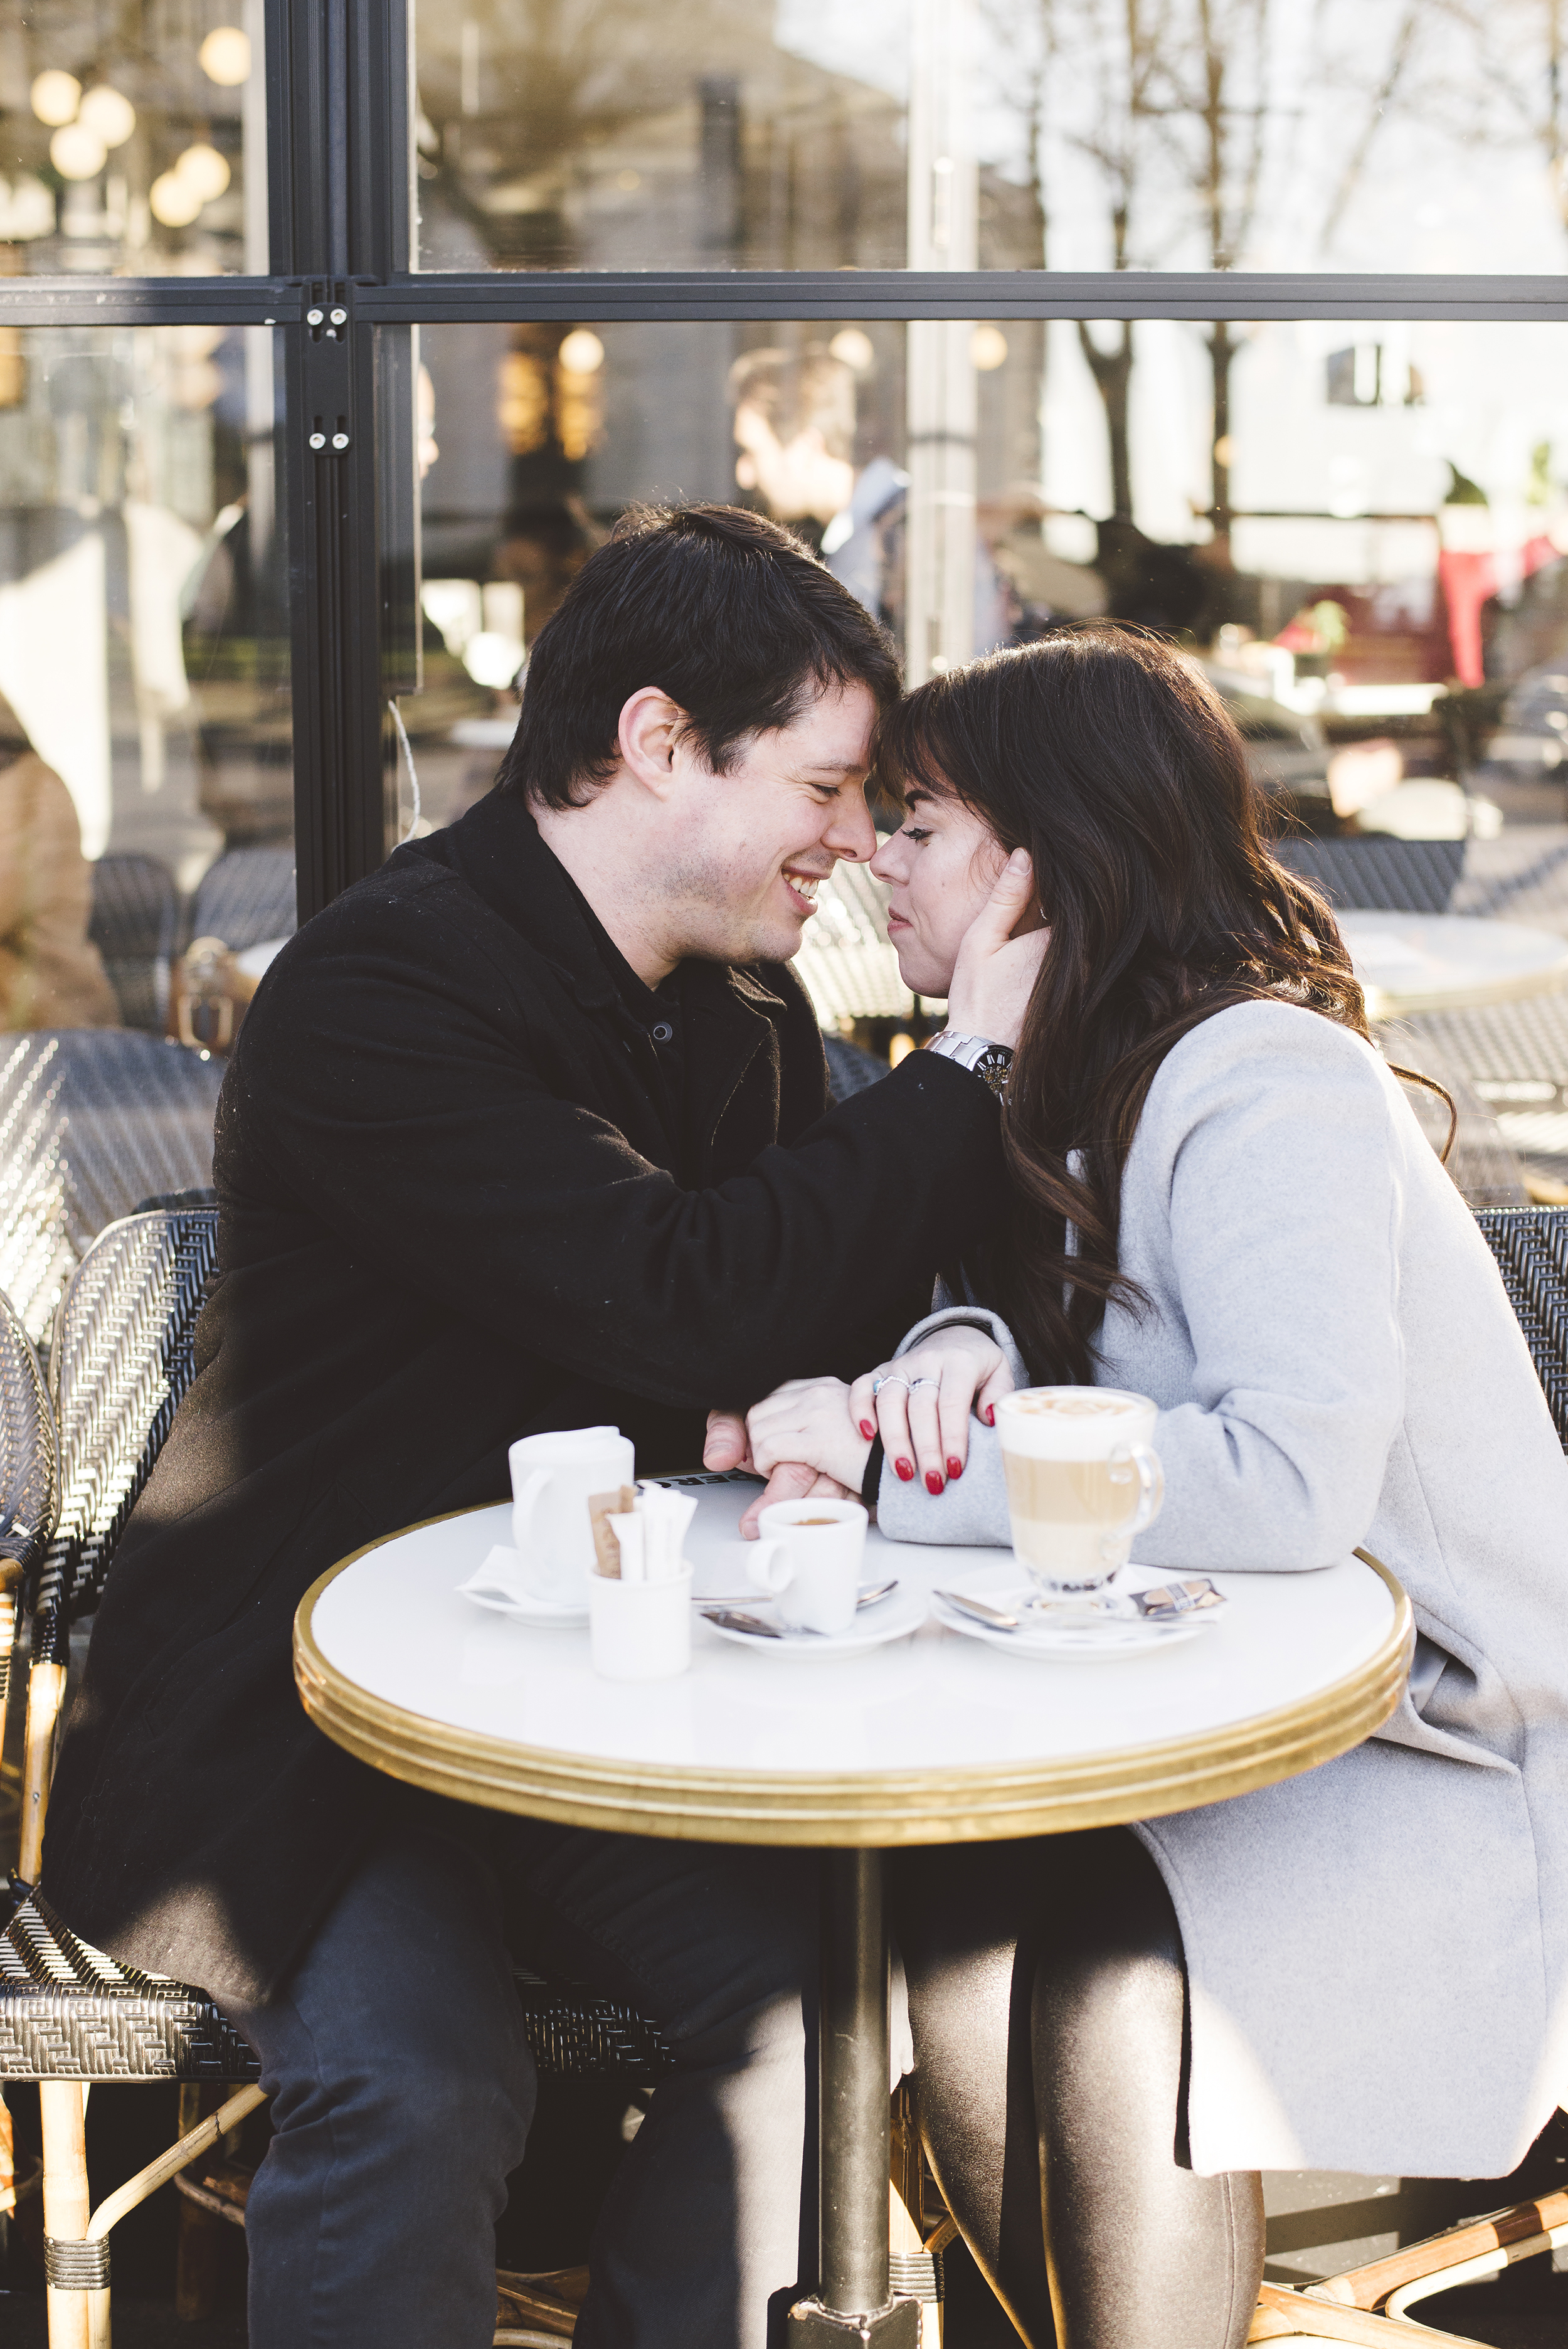 Anniversary-photoshoot-Paris-Trocadero-EiffelTower-Cafe-093.jpg